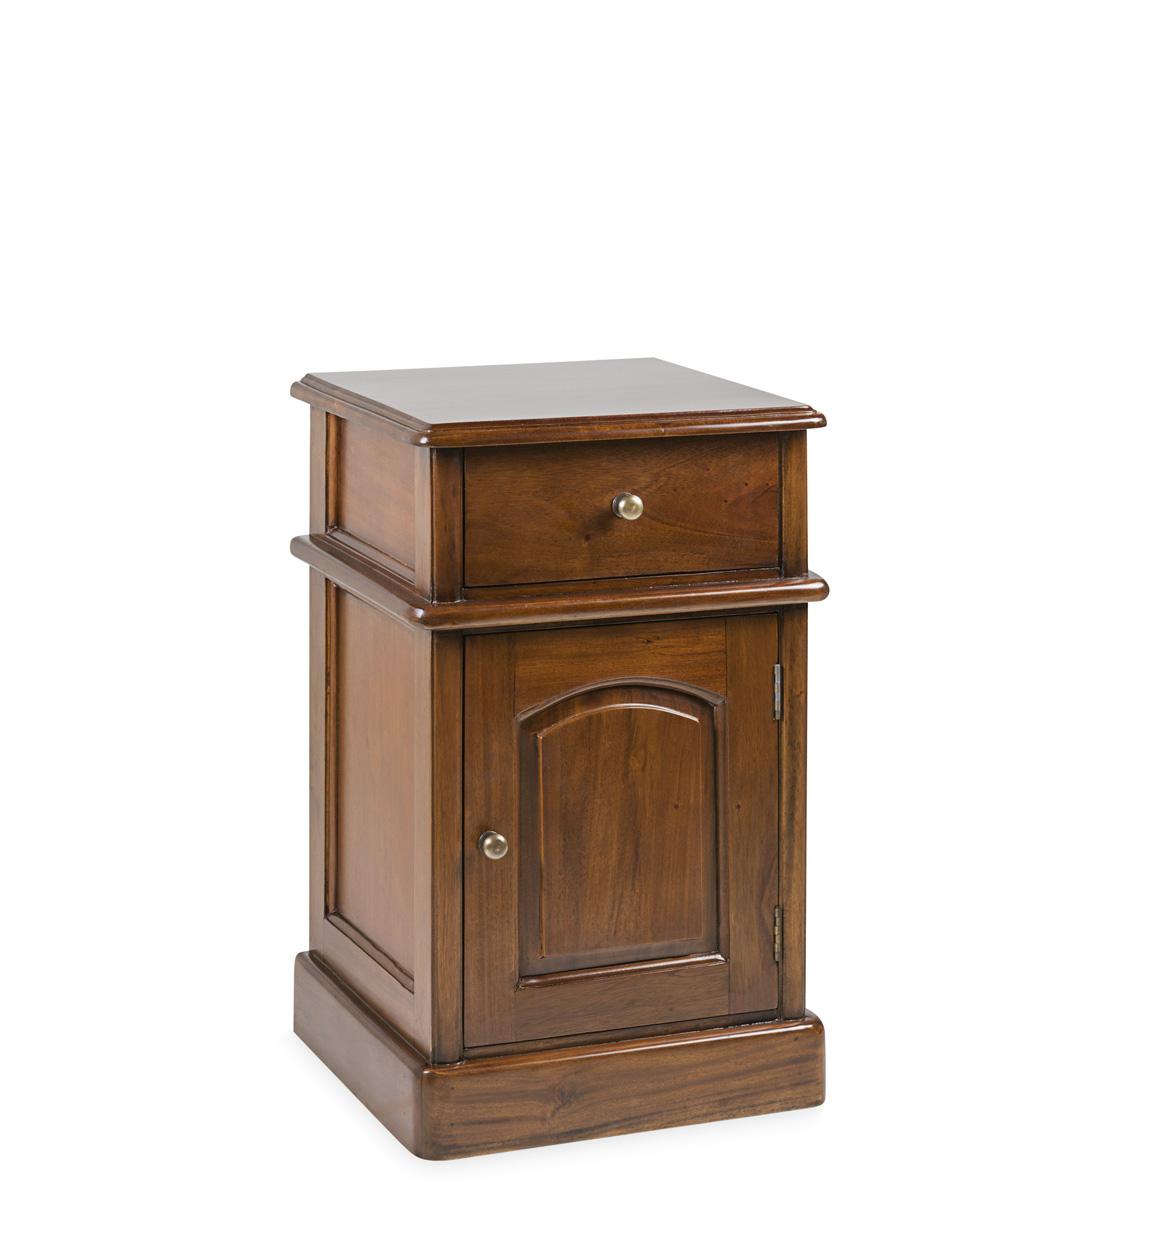 Table de chevet en bois marron